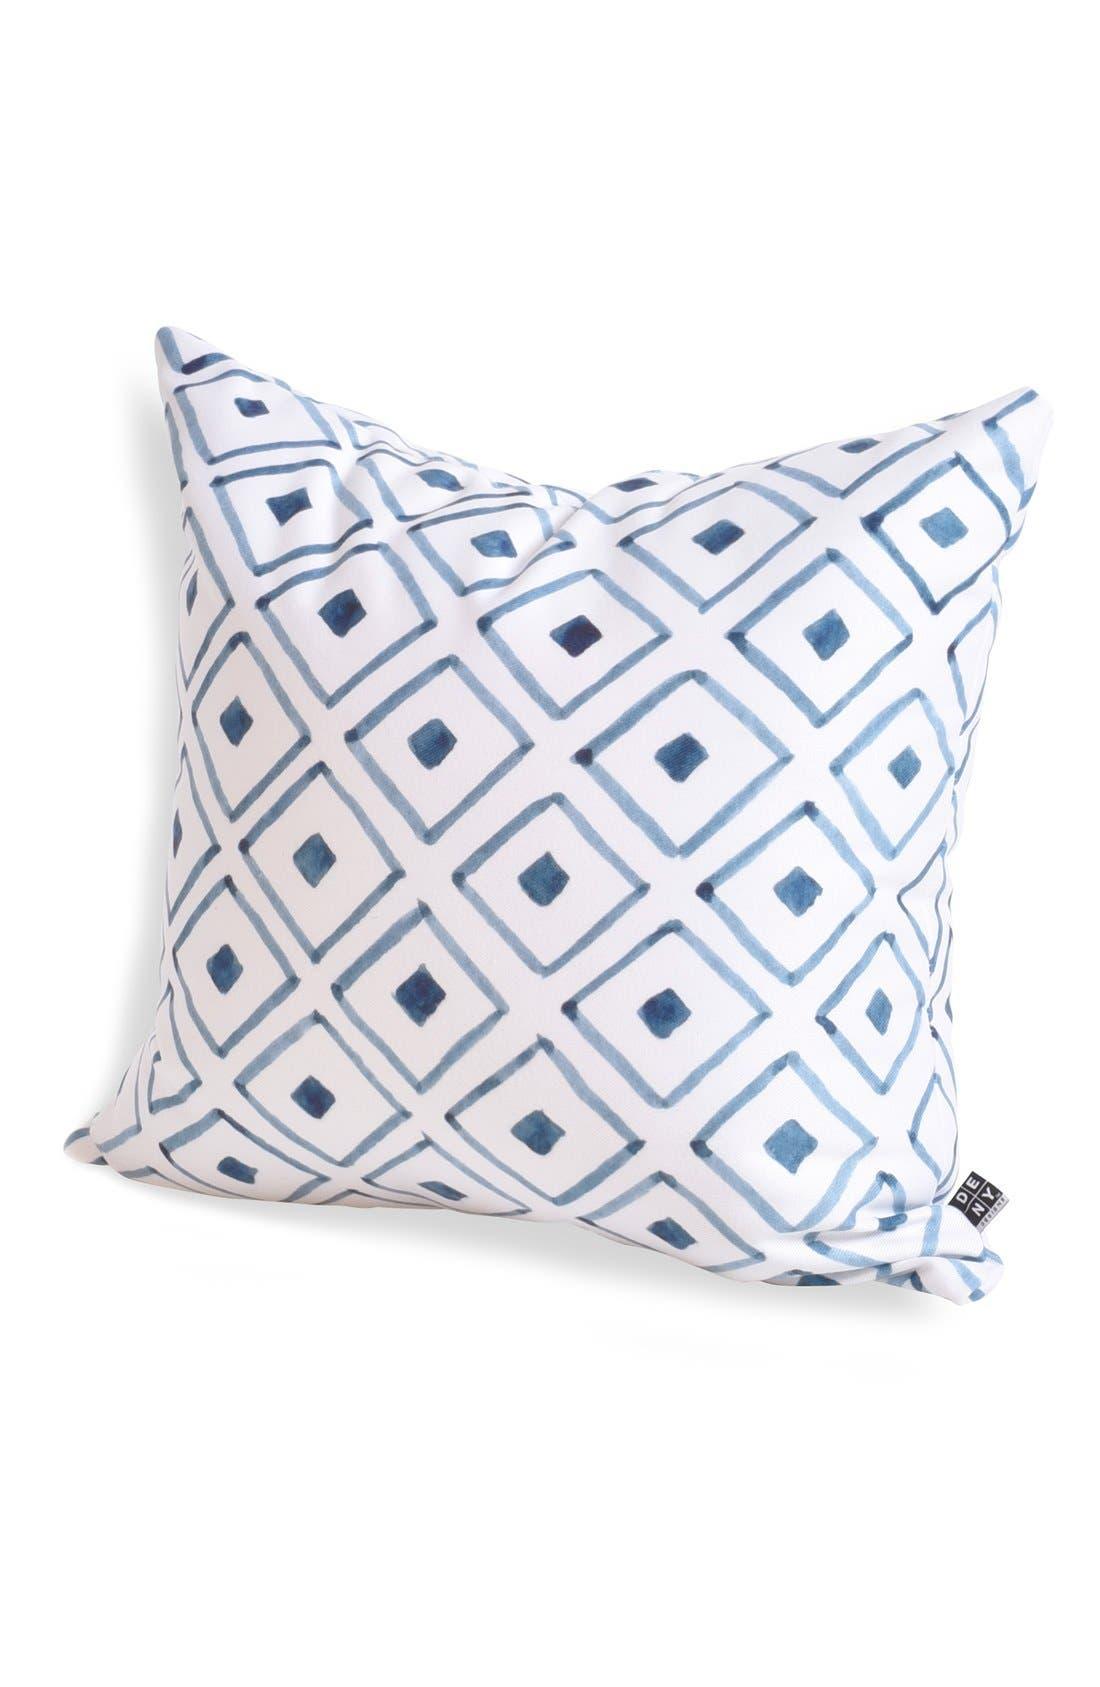 Main Image - Deny Designs 'Social Proper Ascot' Pillow